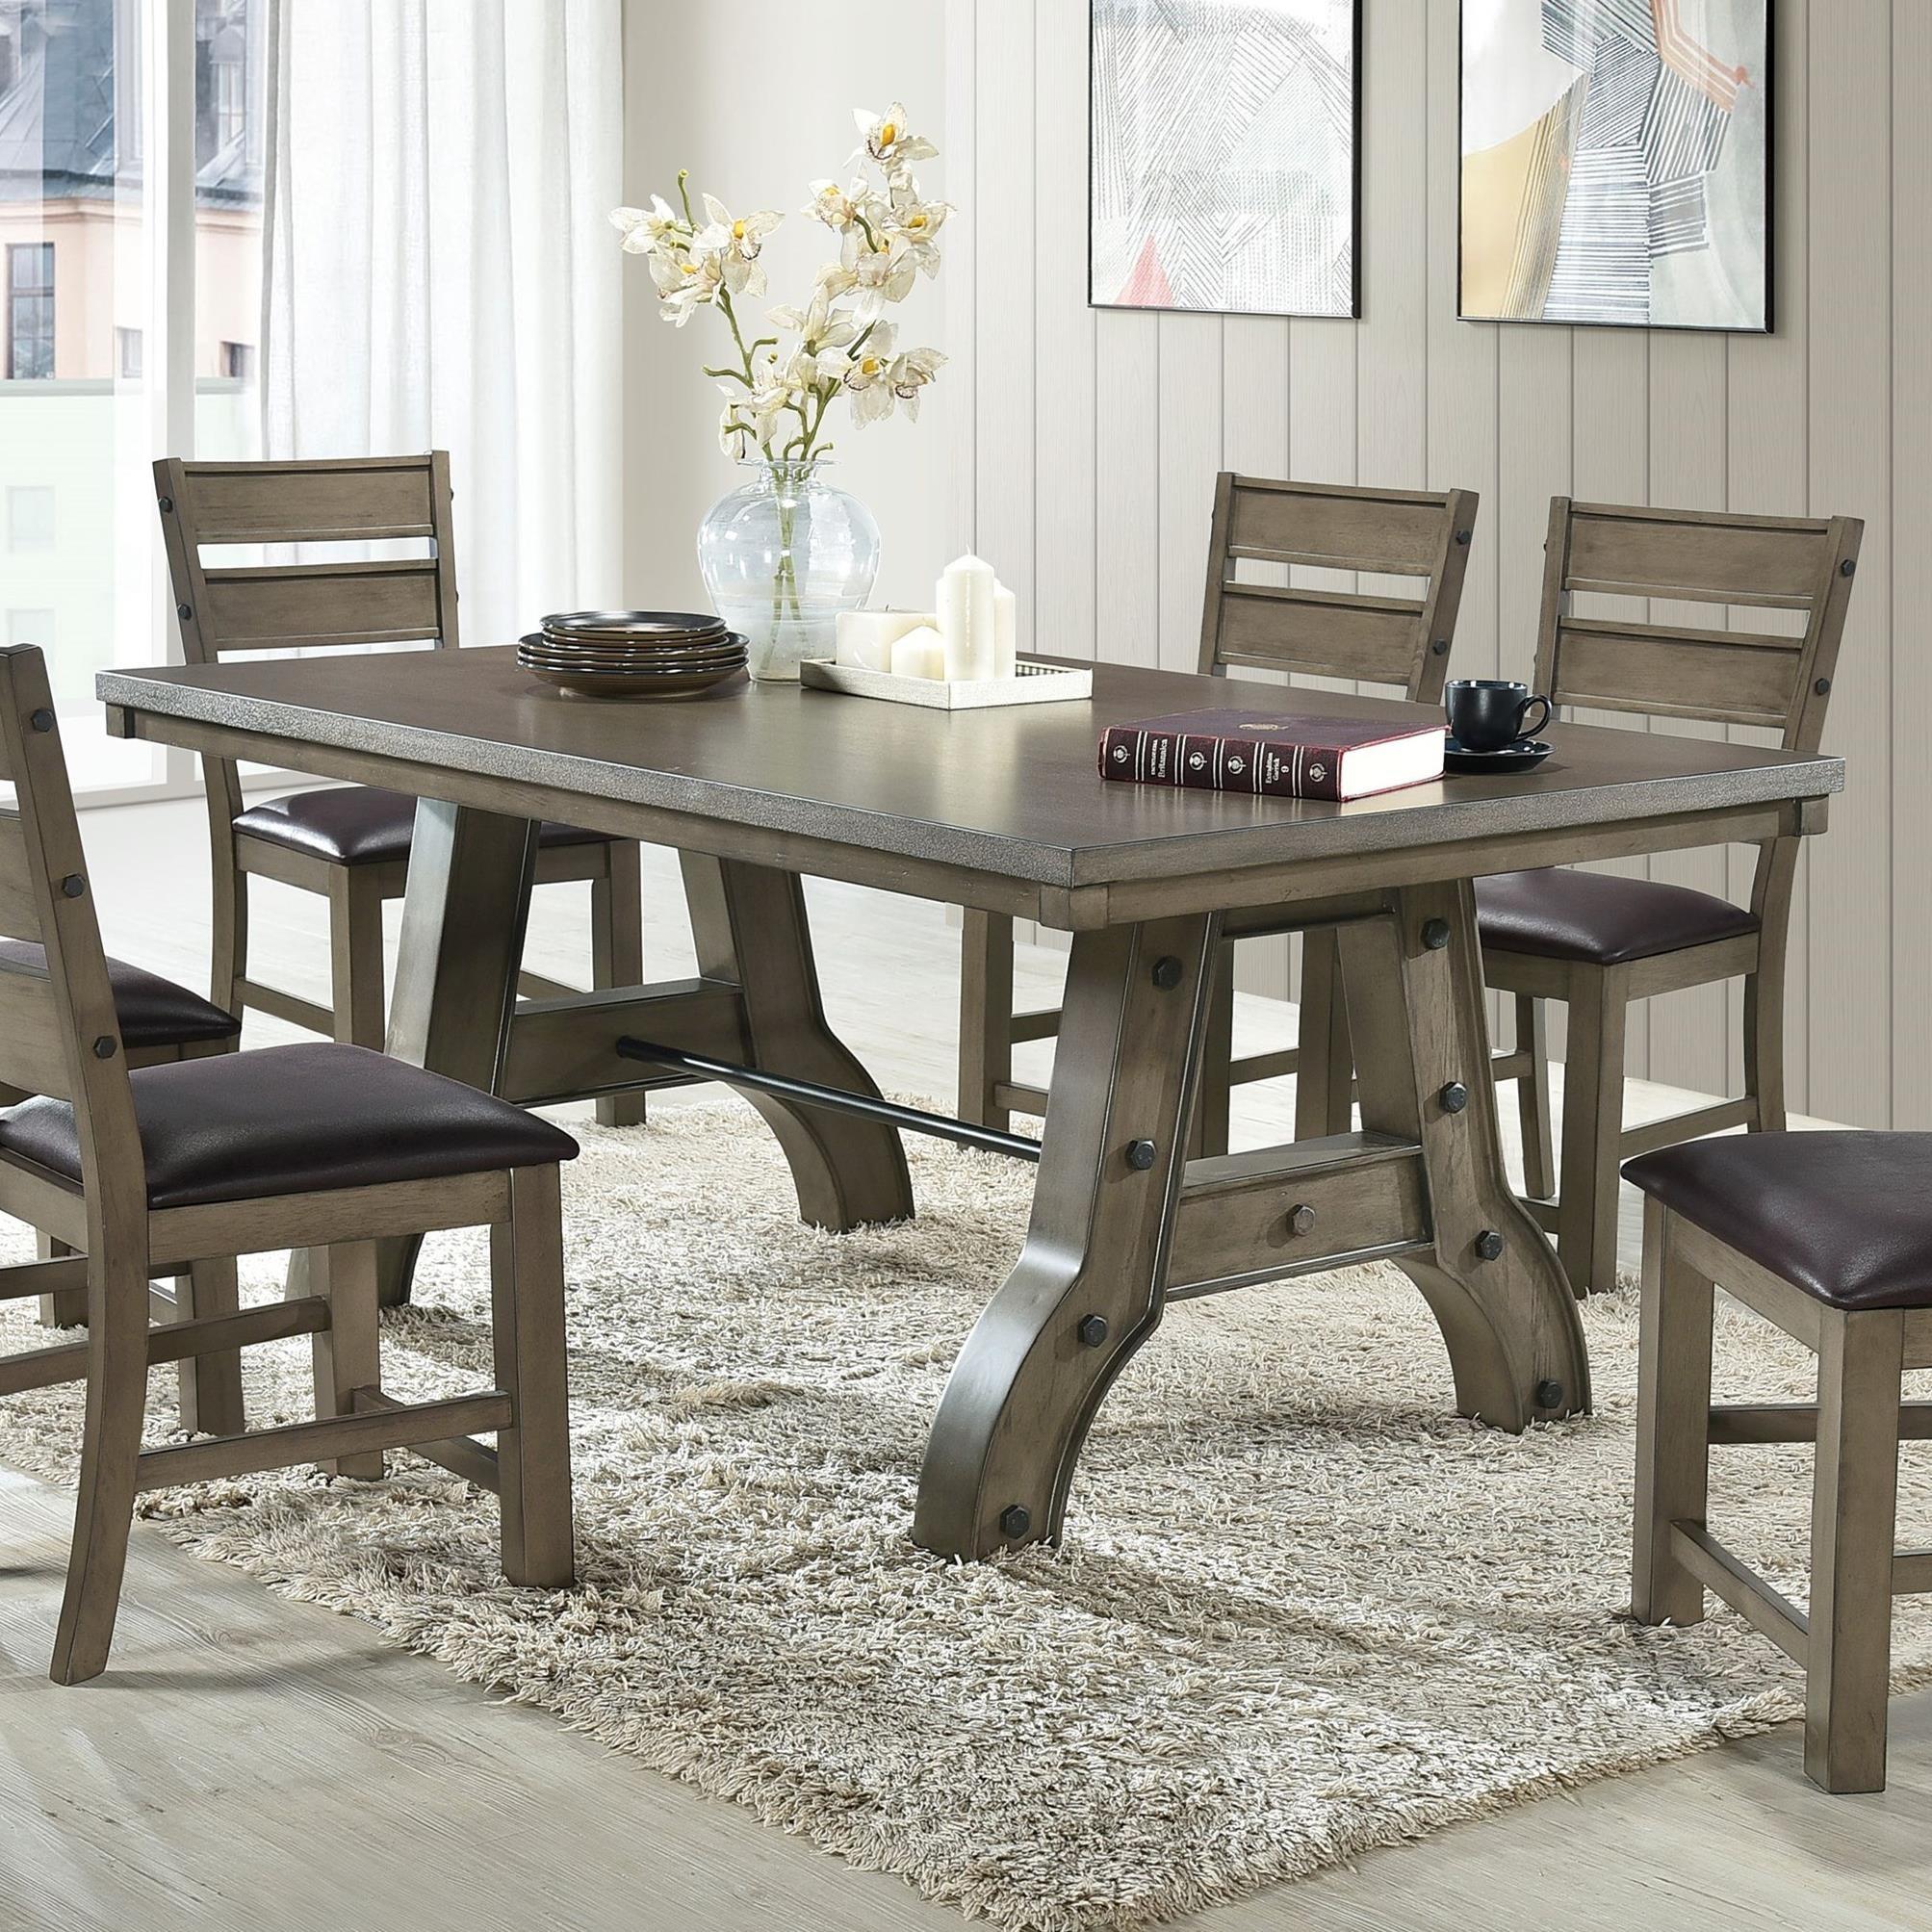 Rishima Dining Table by Acme Furniture at Carolina Direct